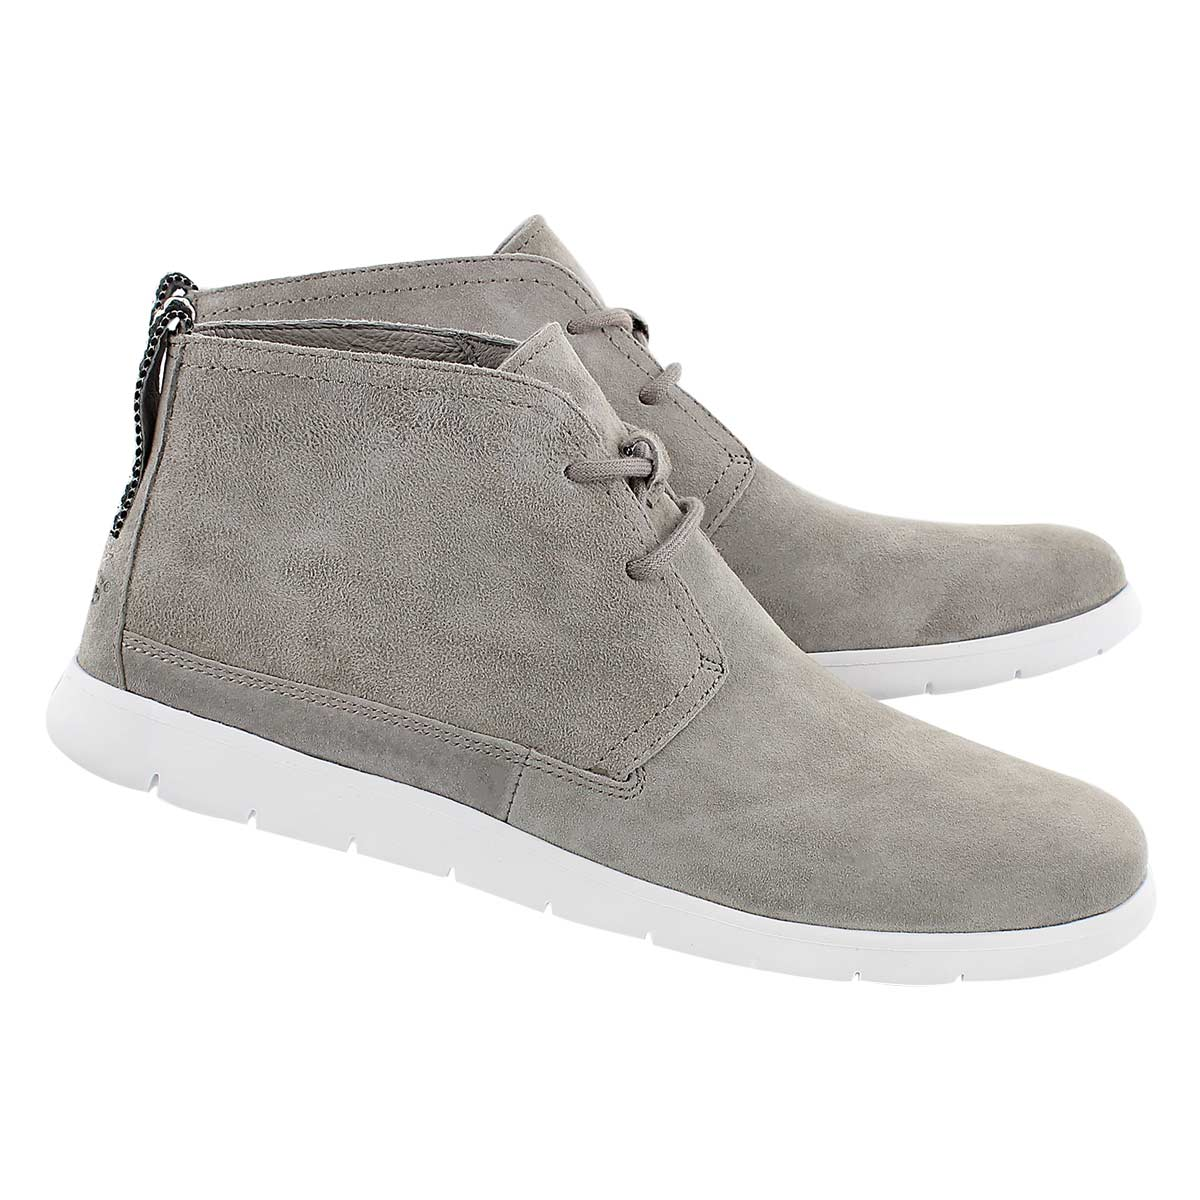 Mns Freamon seal casual chukka boot